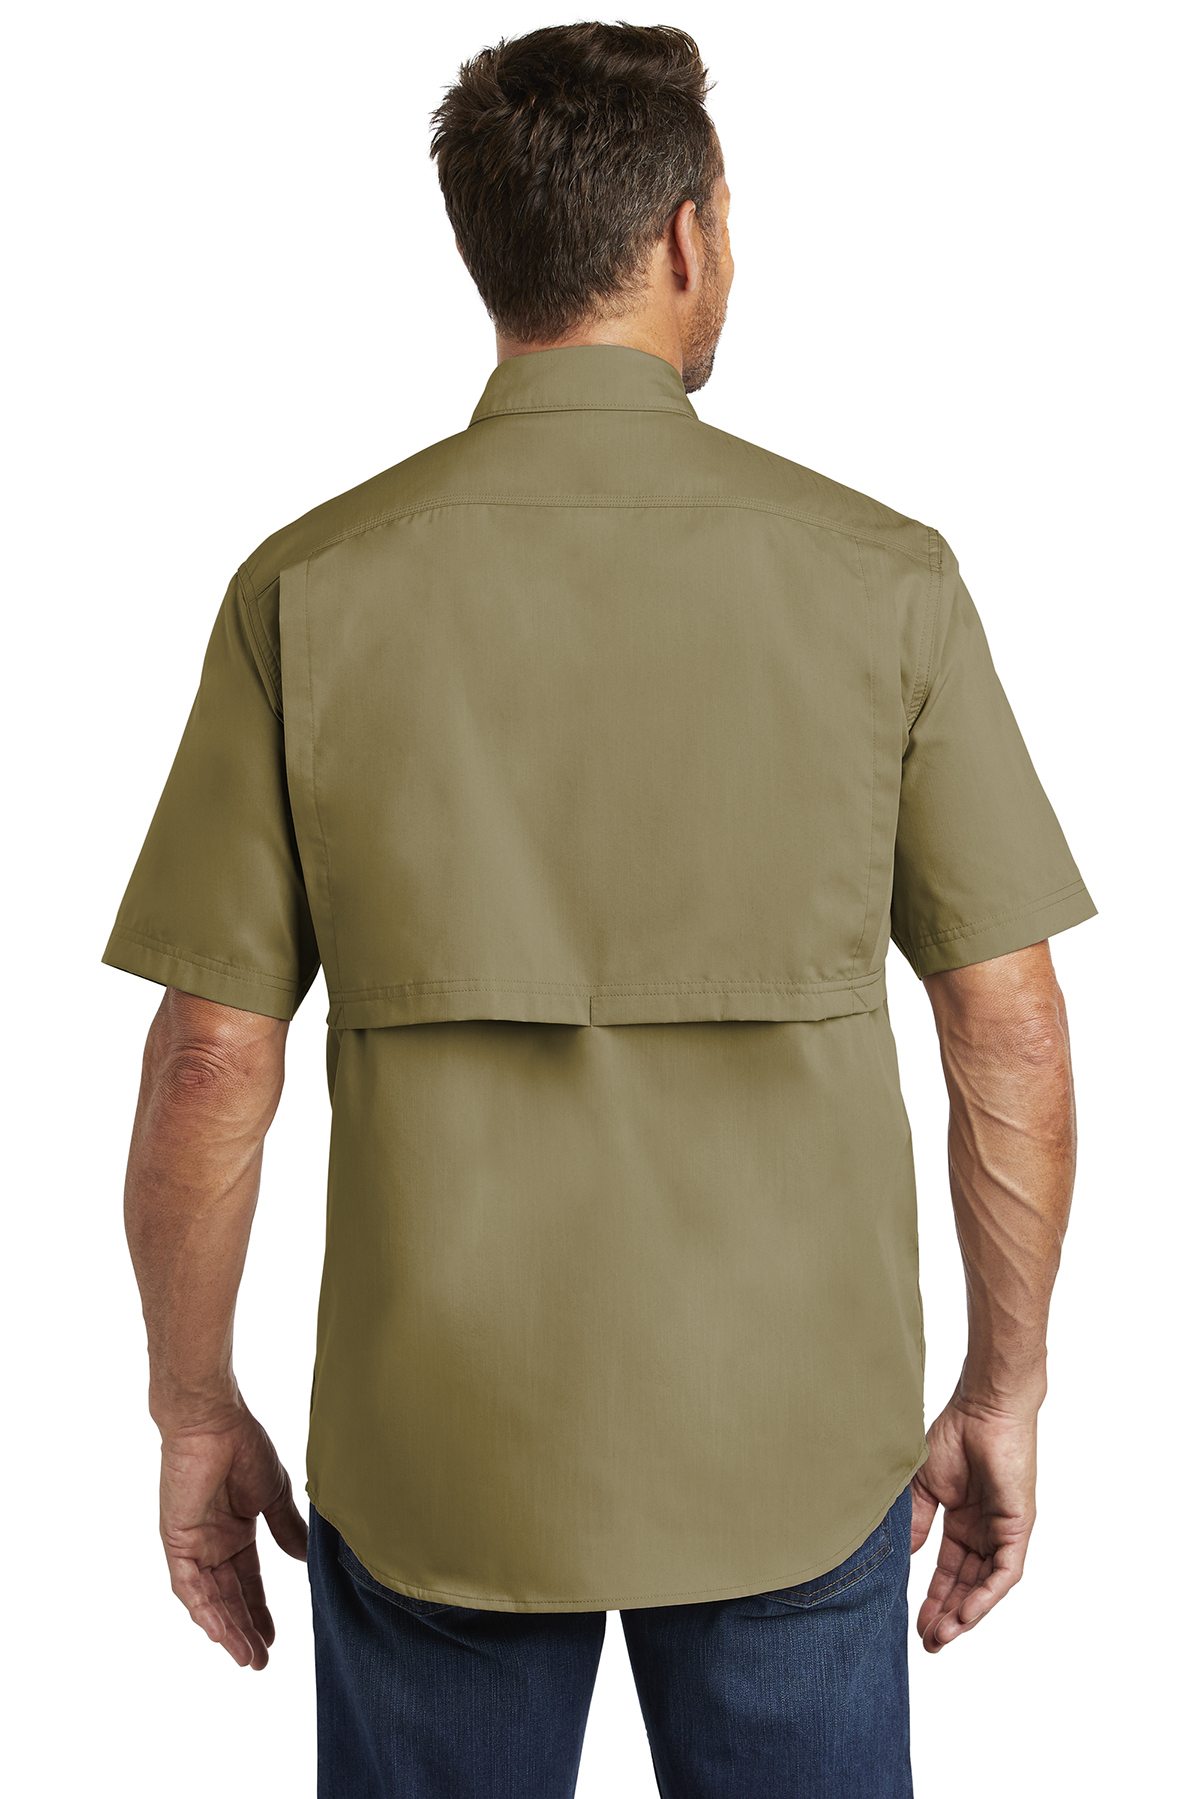 6a8c01295c Carhartt Force ® Ridgefield Solid Short Sleeve Shirt | Carhartt ...